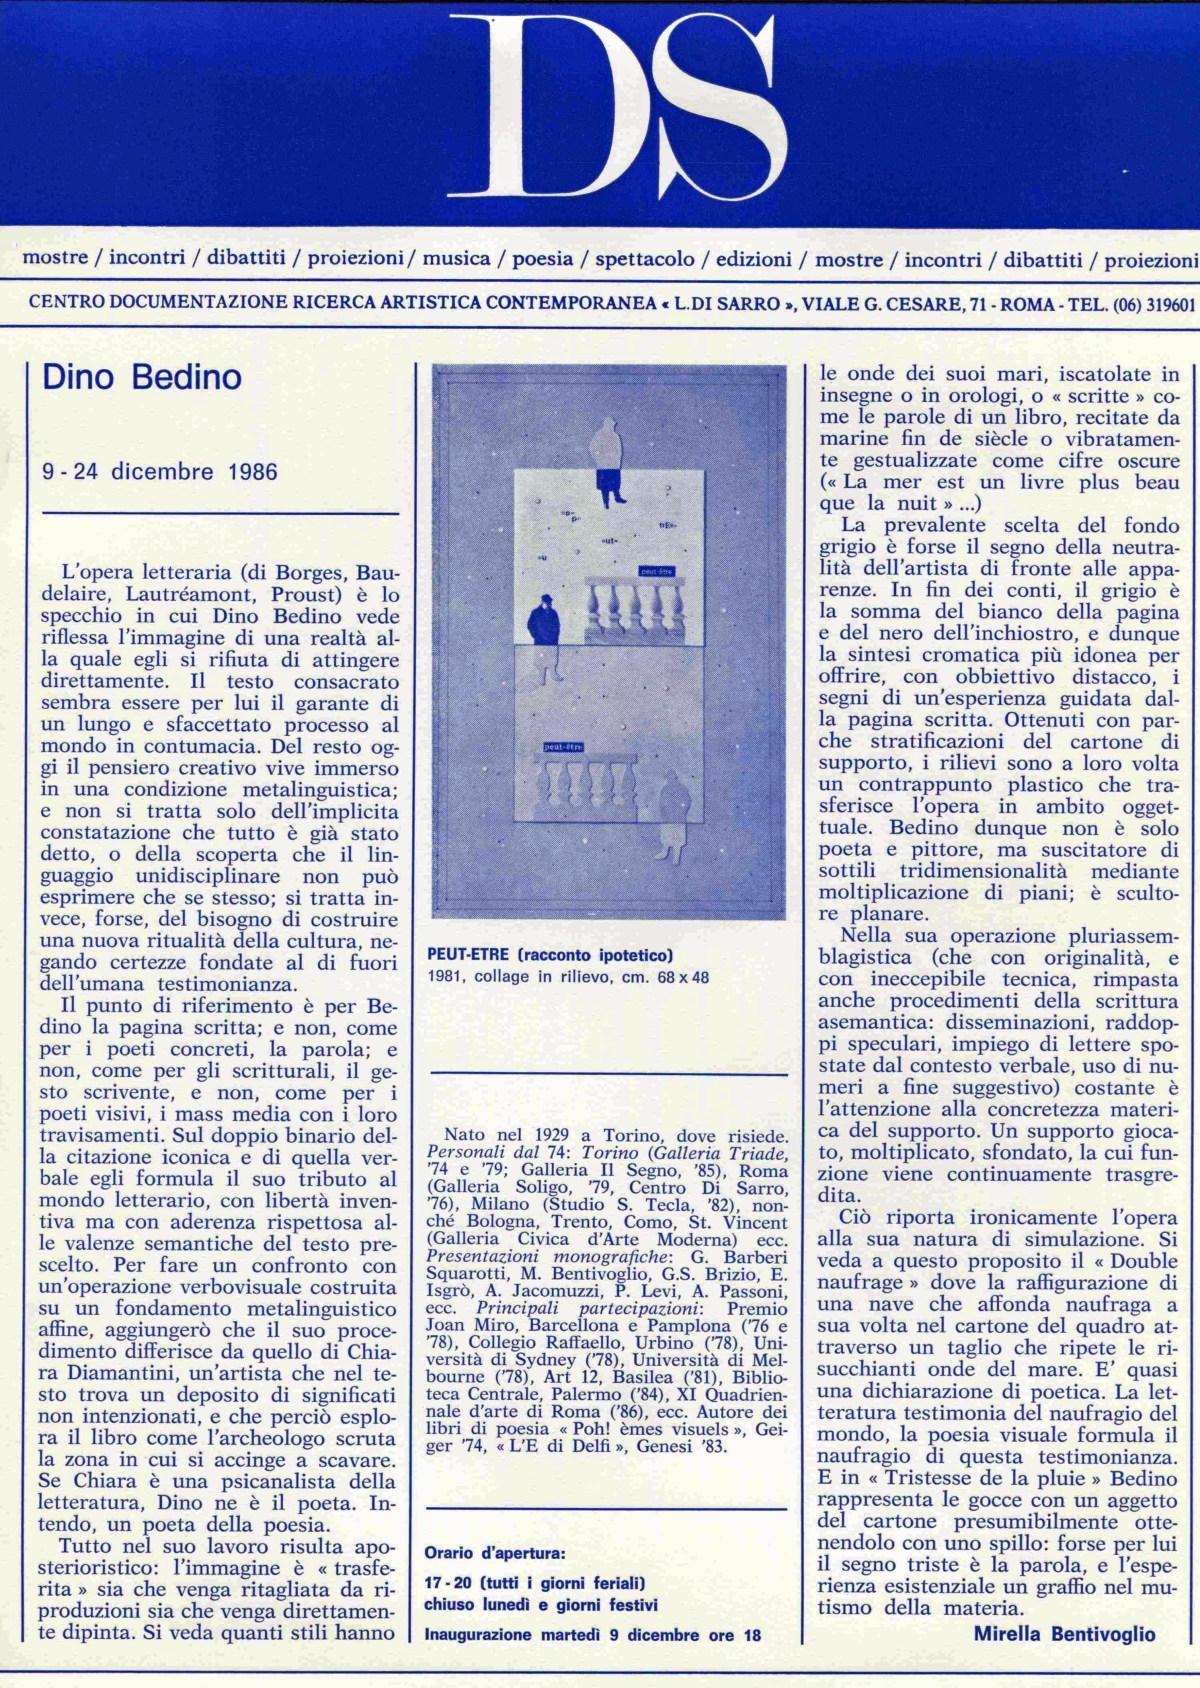 Dino Bedino 9 - 24 dicembre 1986